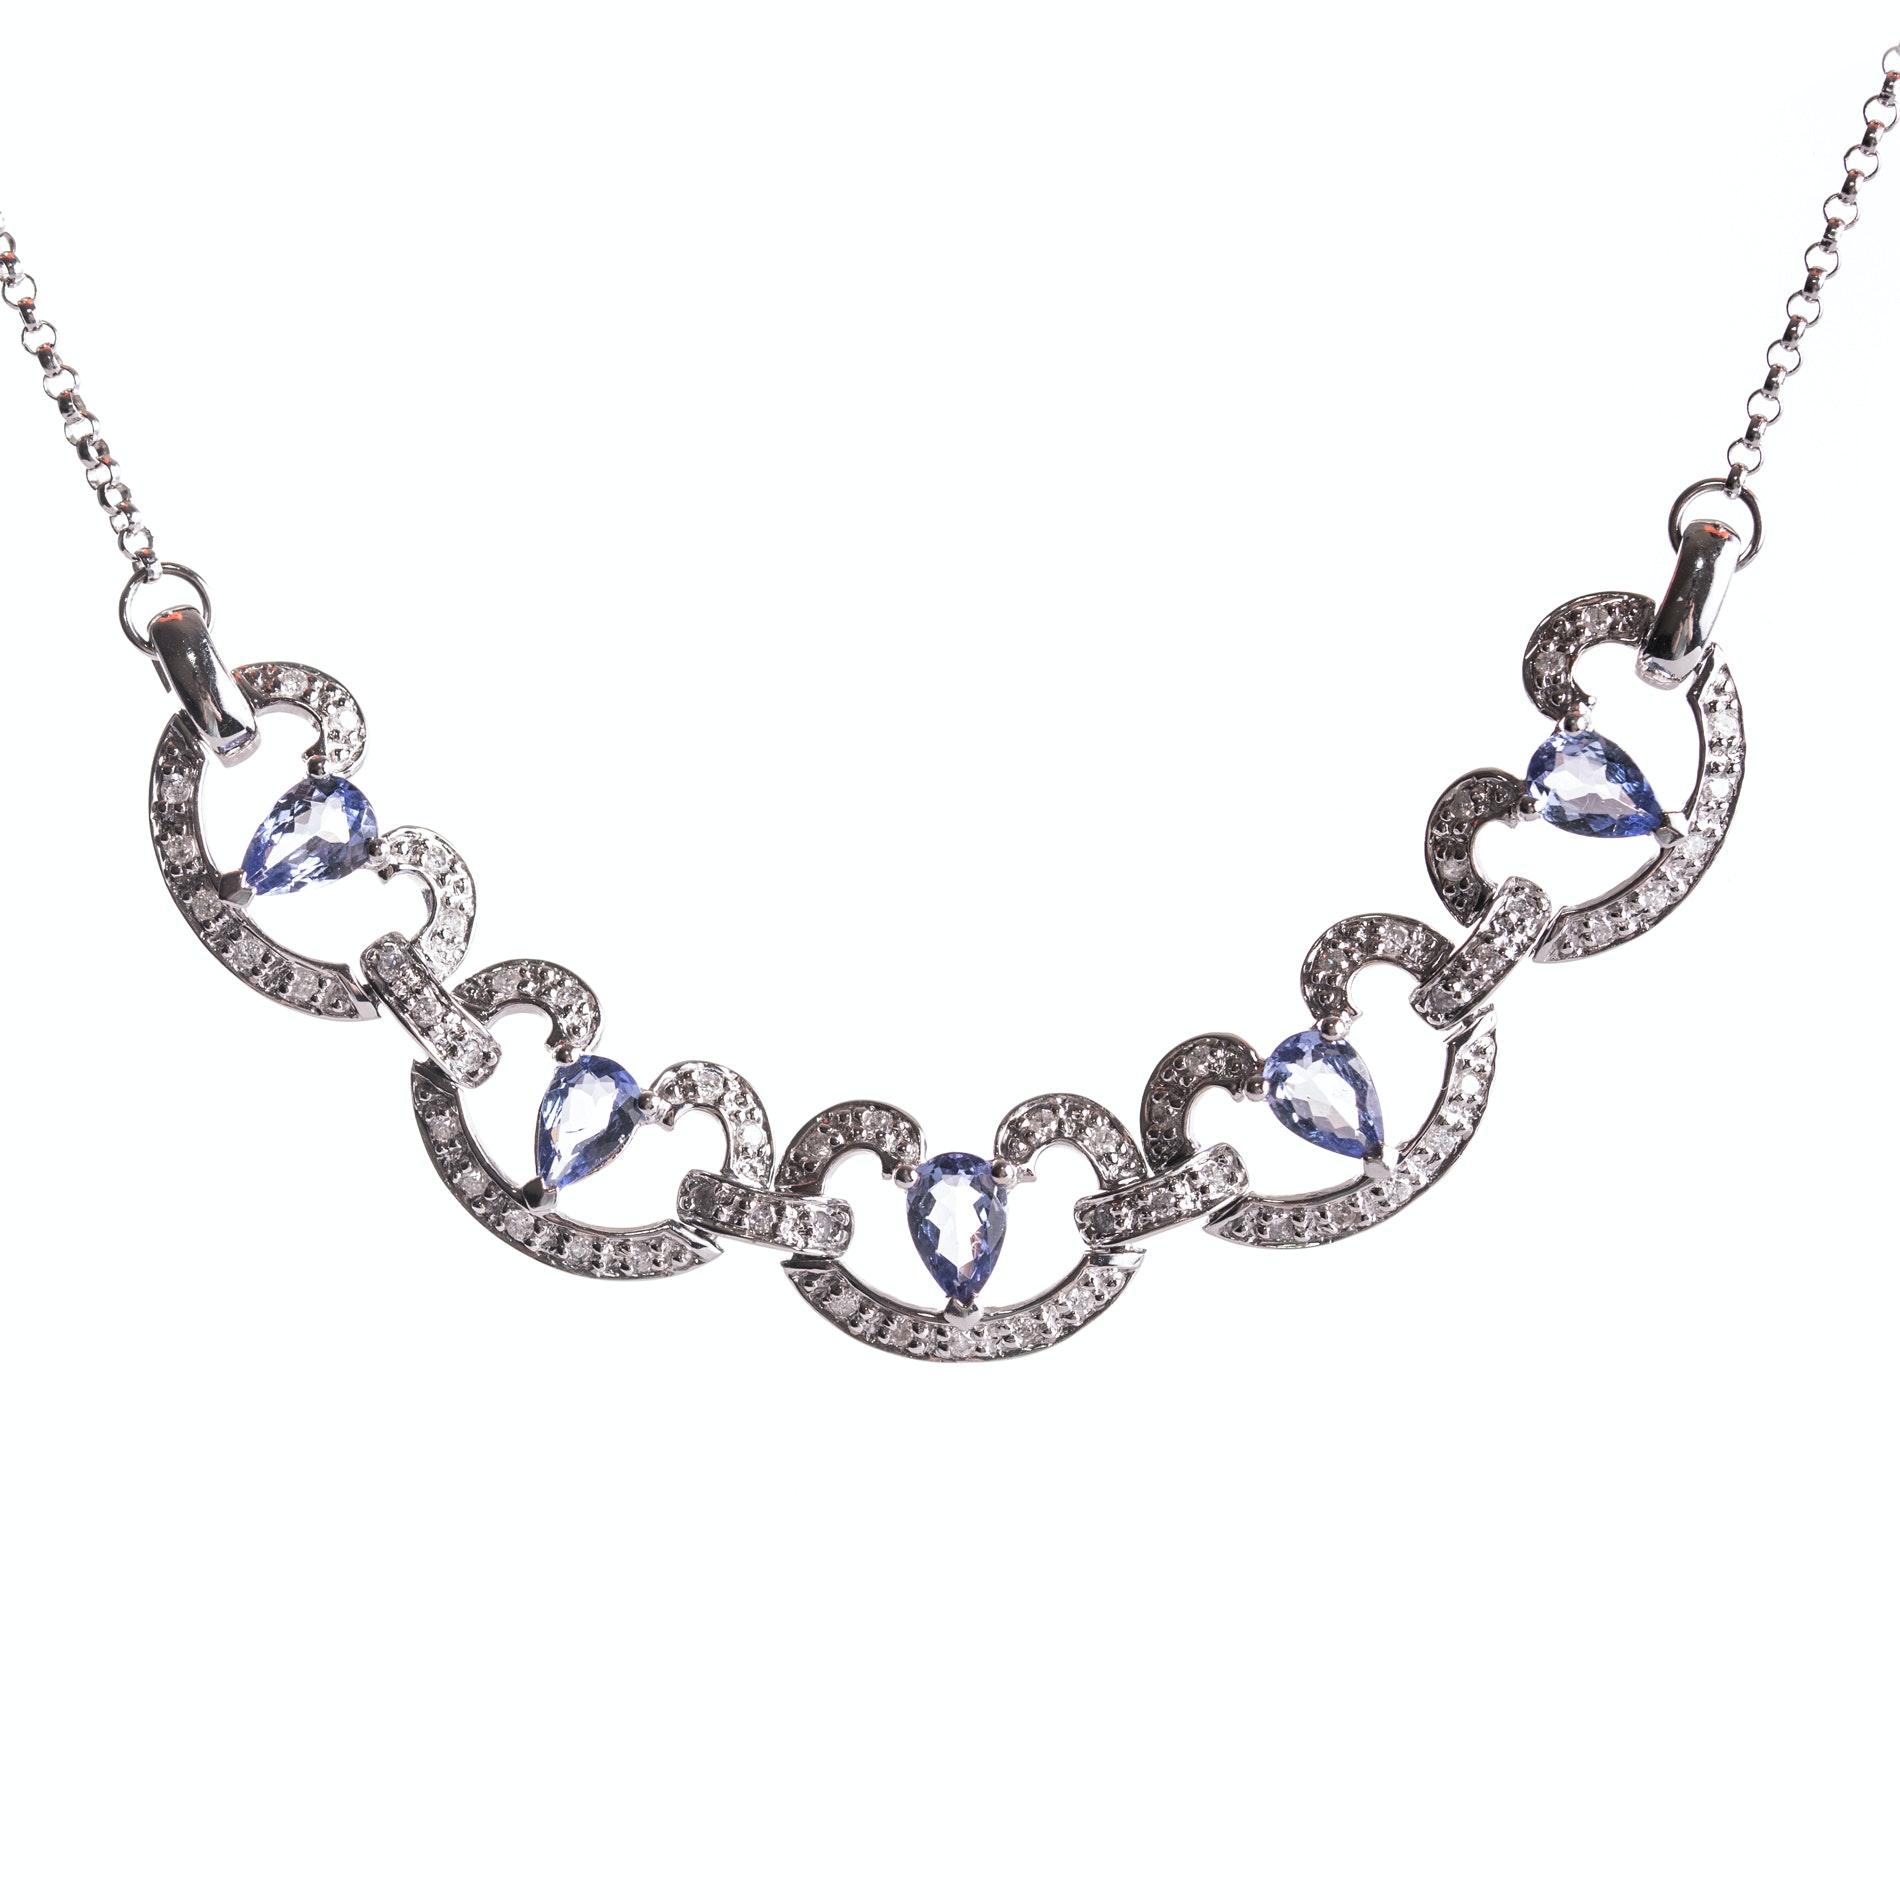 14K White Gold Diamond and Tanzanite Necklace